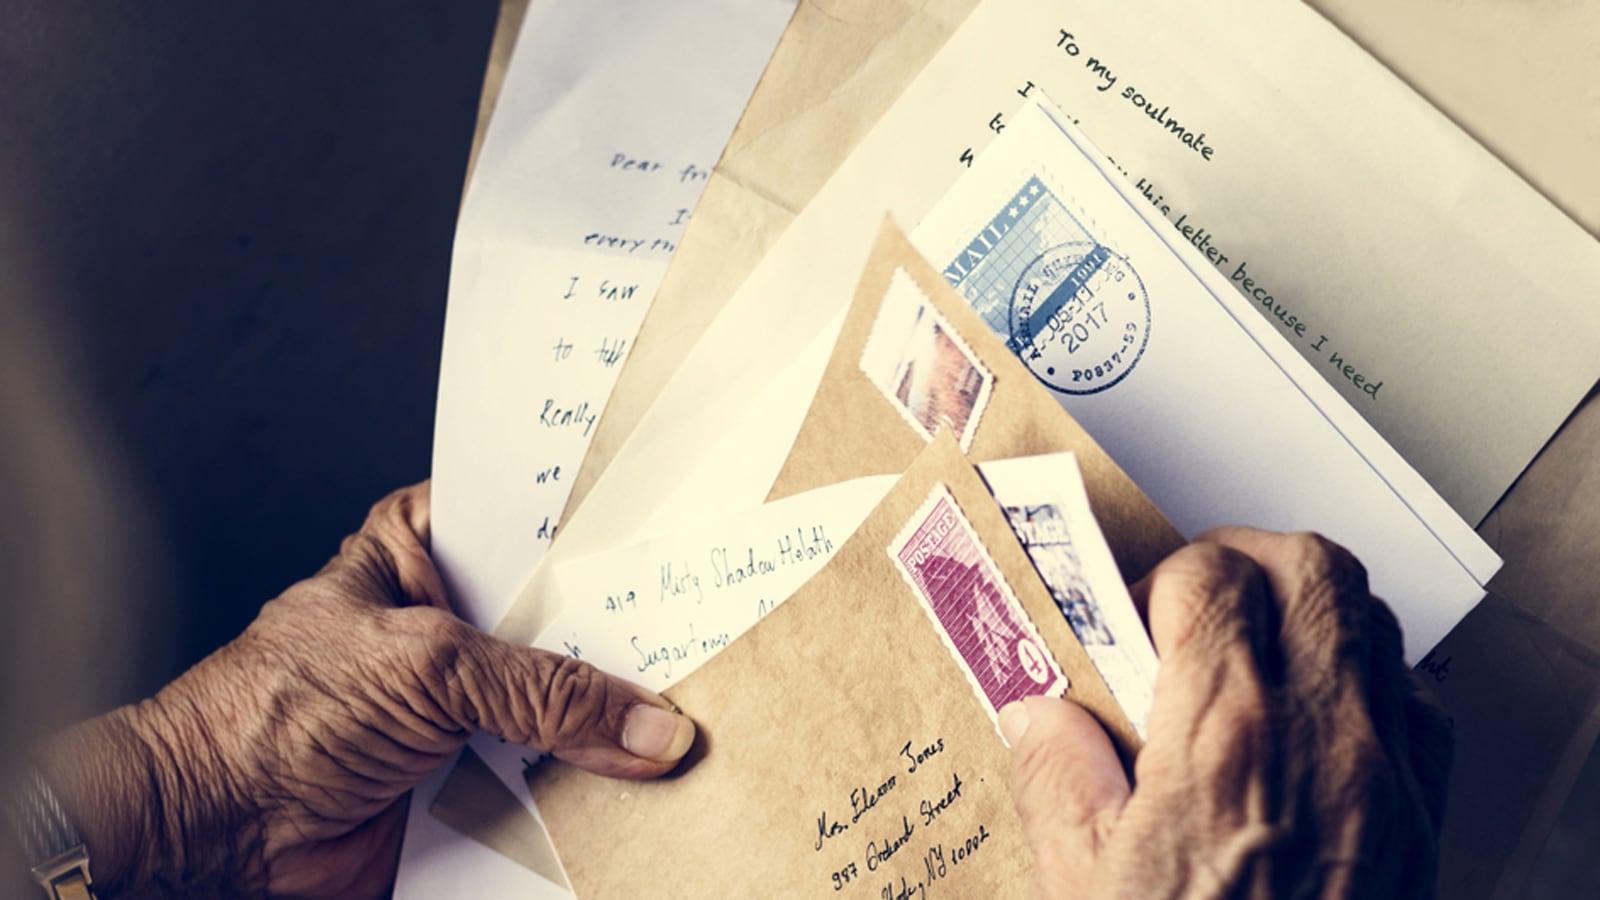 Liebesbrief schreiben – so kommt er gut an